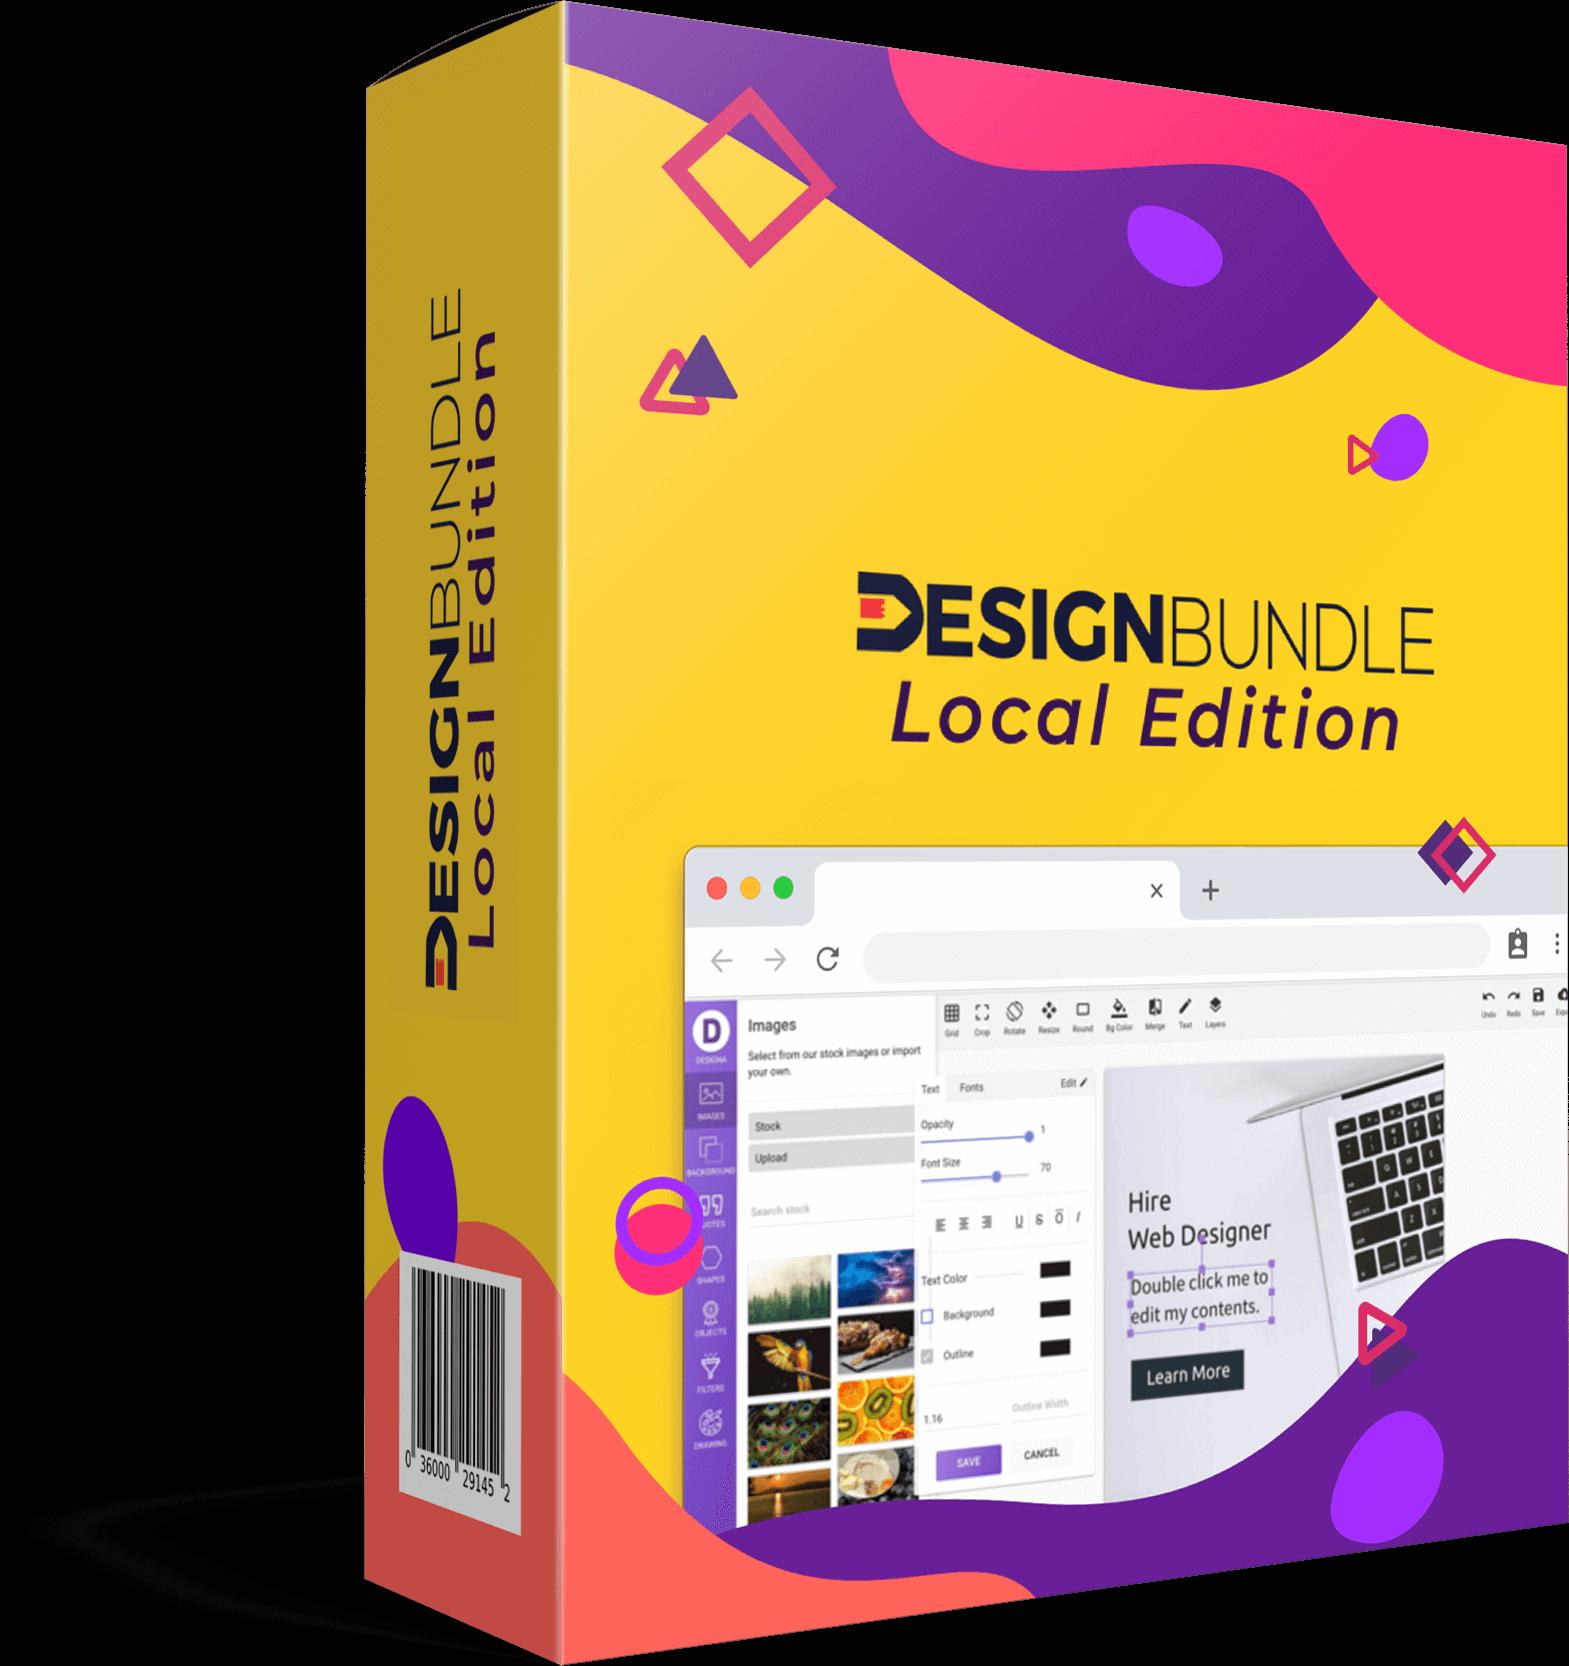 Designbundle local review